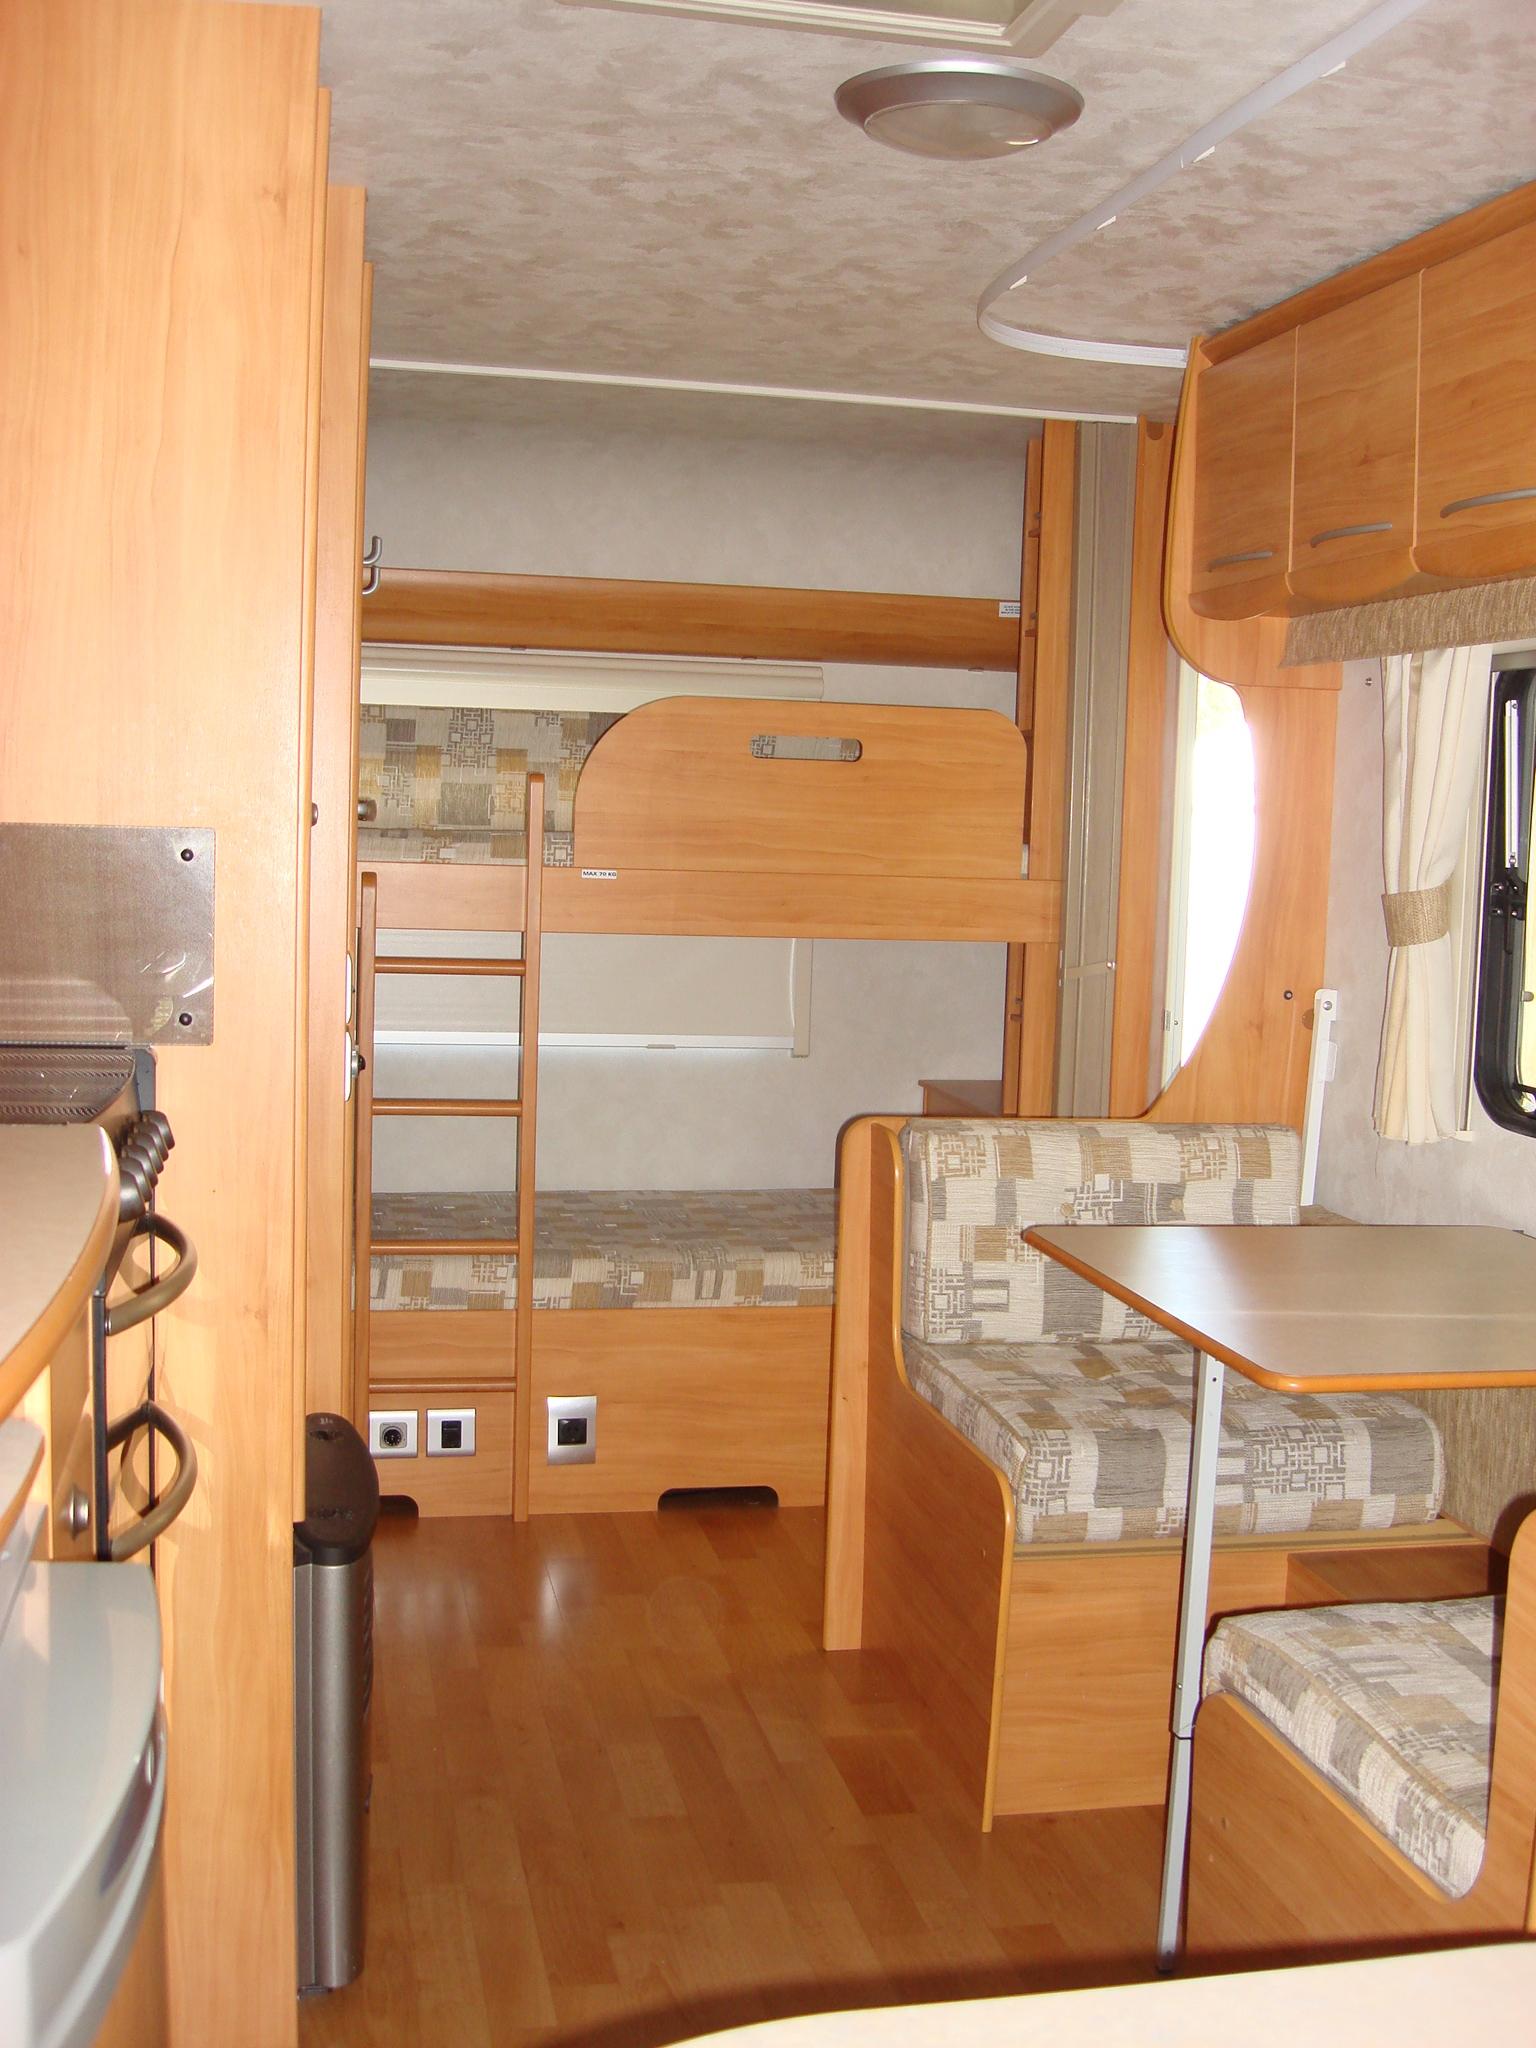 2007 Adria Adora 532uk 6 Berth Family Caravan Ezitow